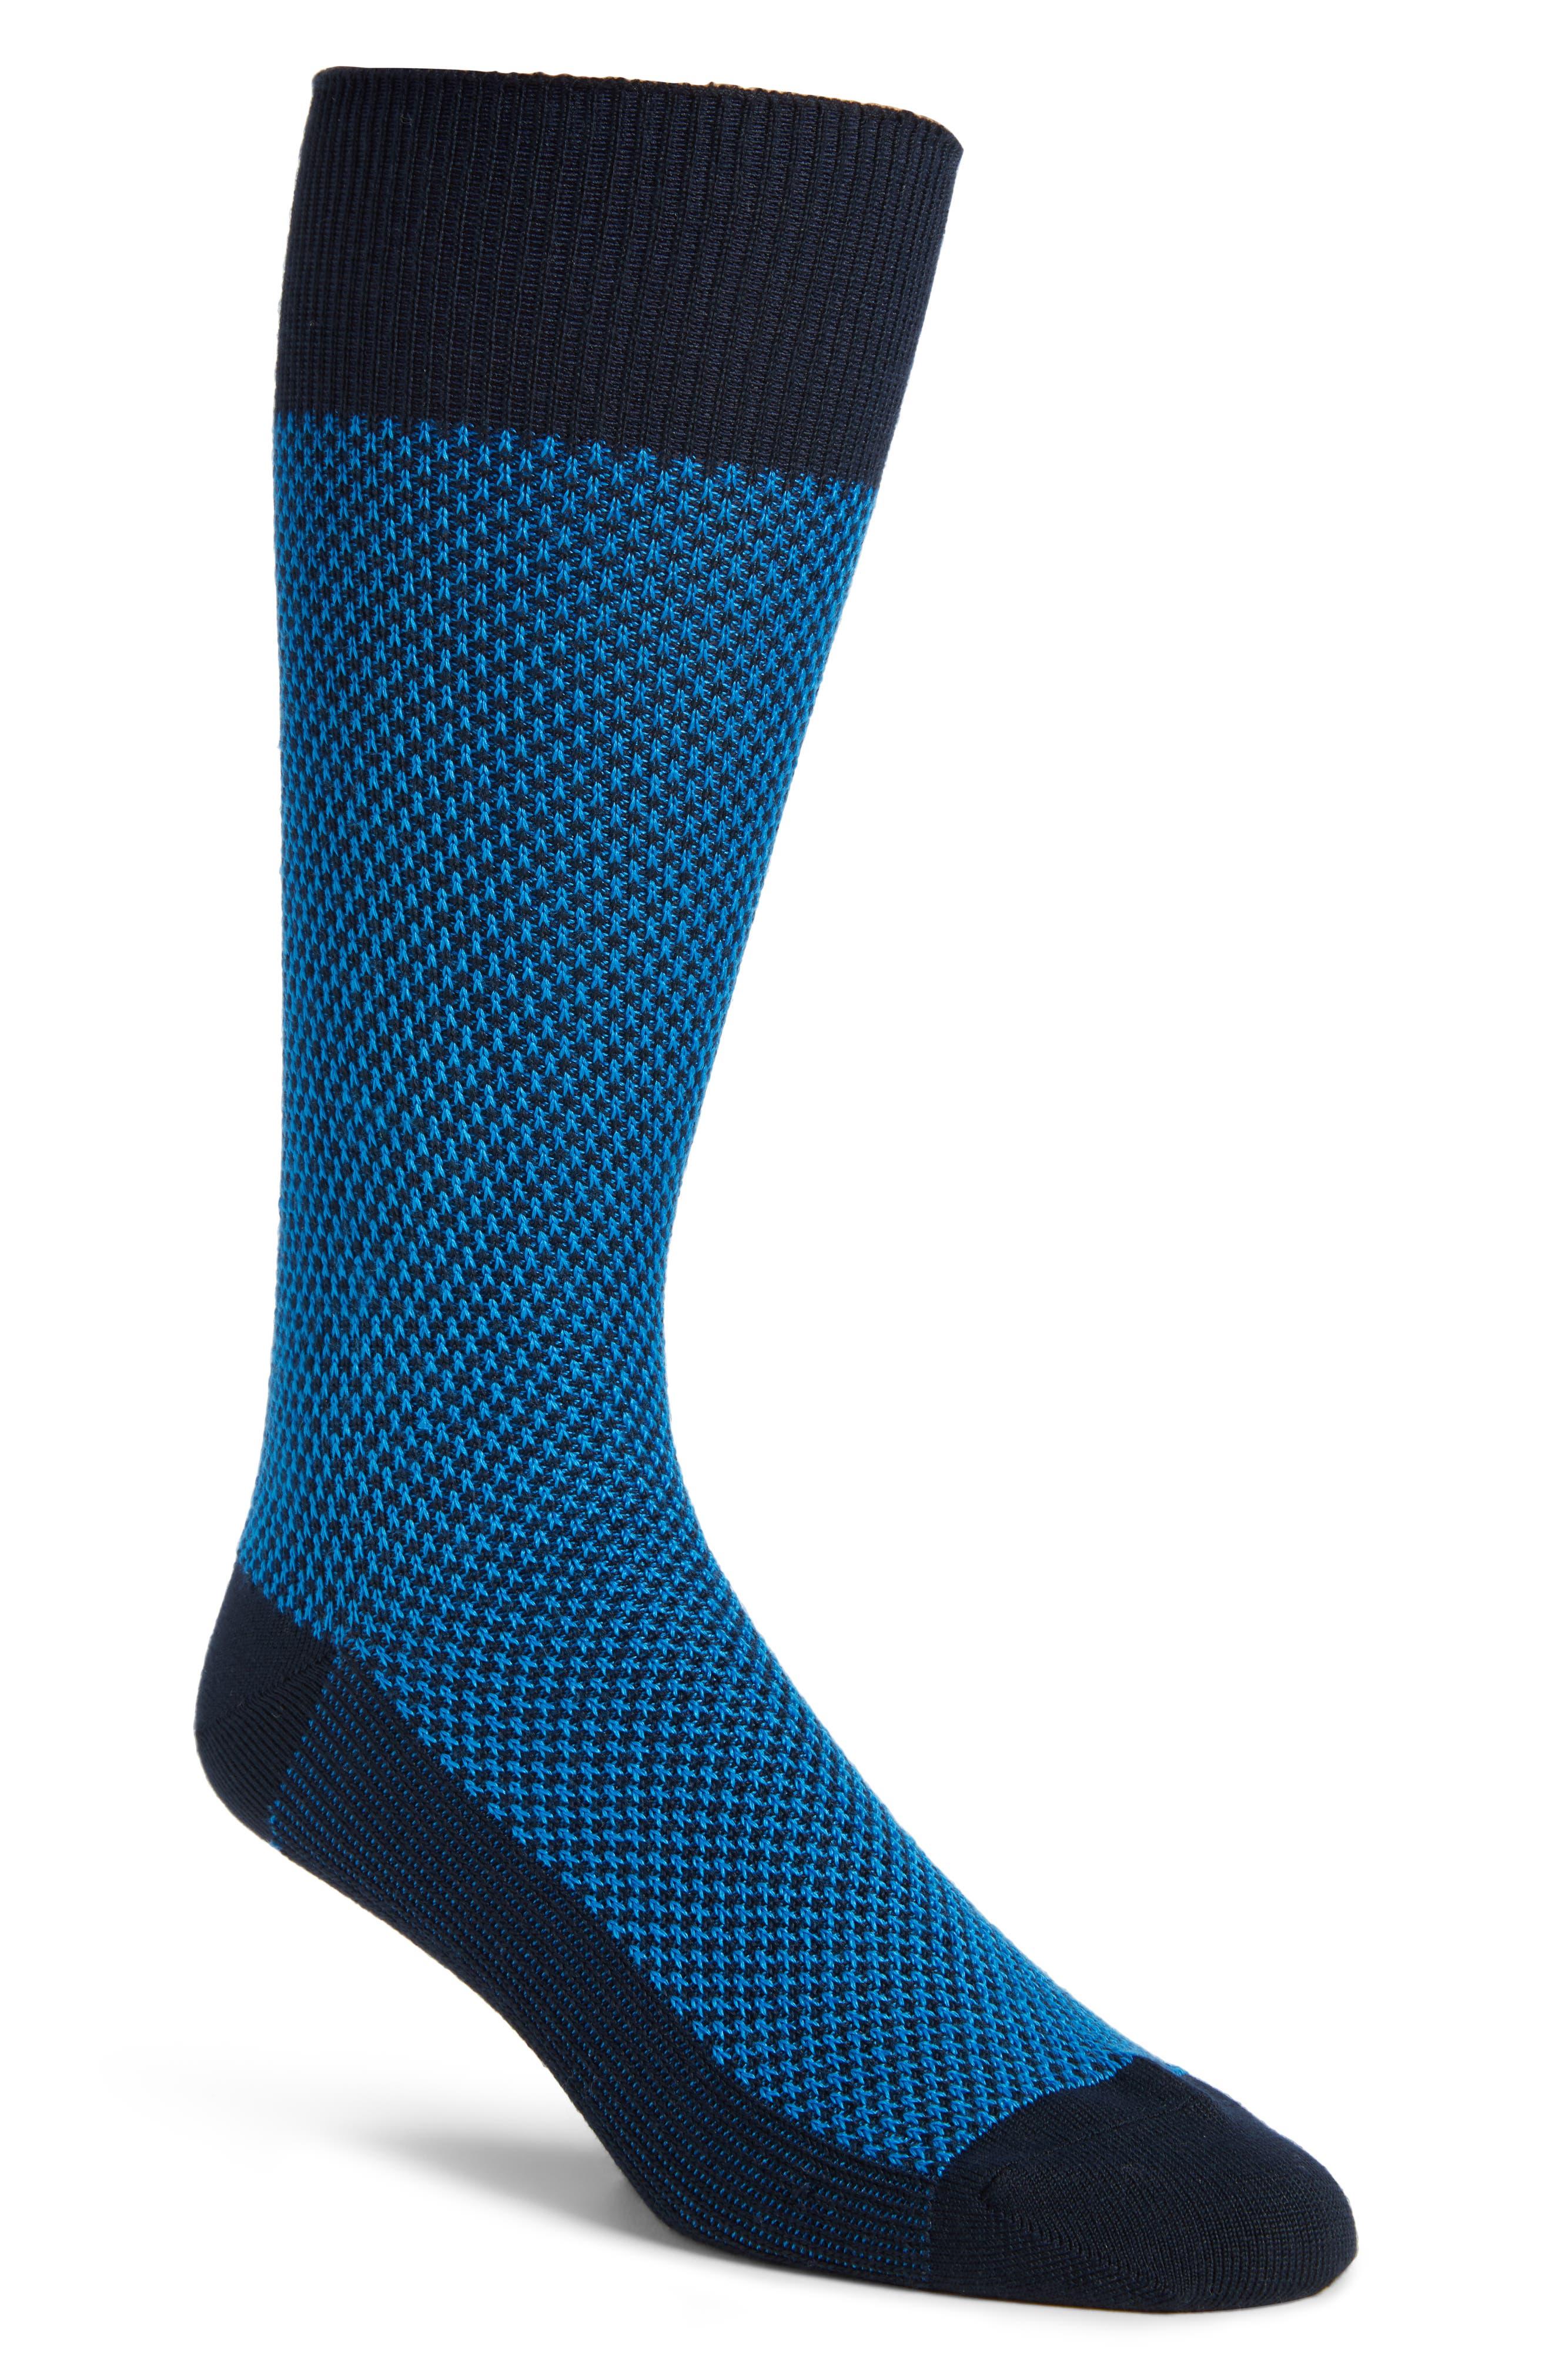 Ultra Soft Textured Socks,                         Main,                         color, Navy/ Blue